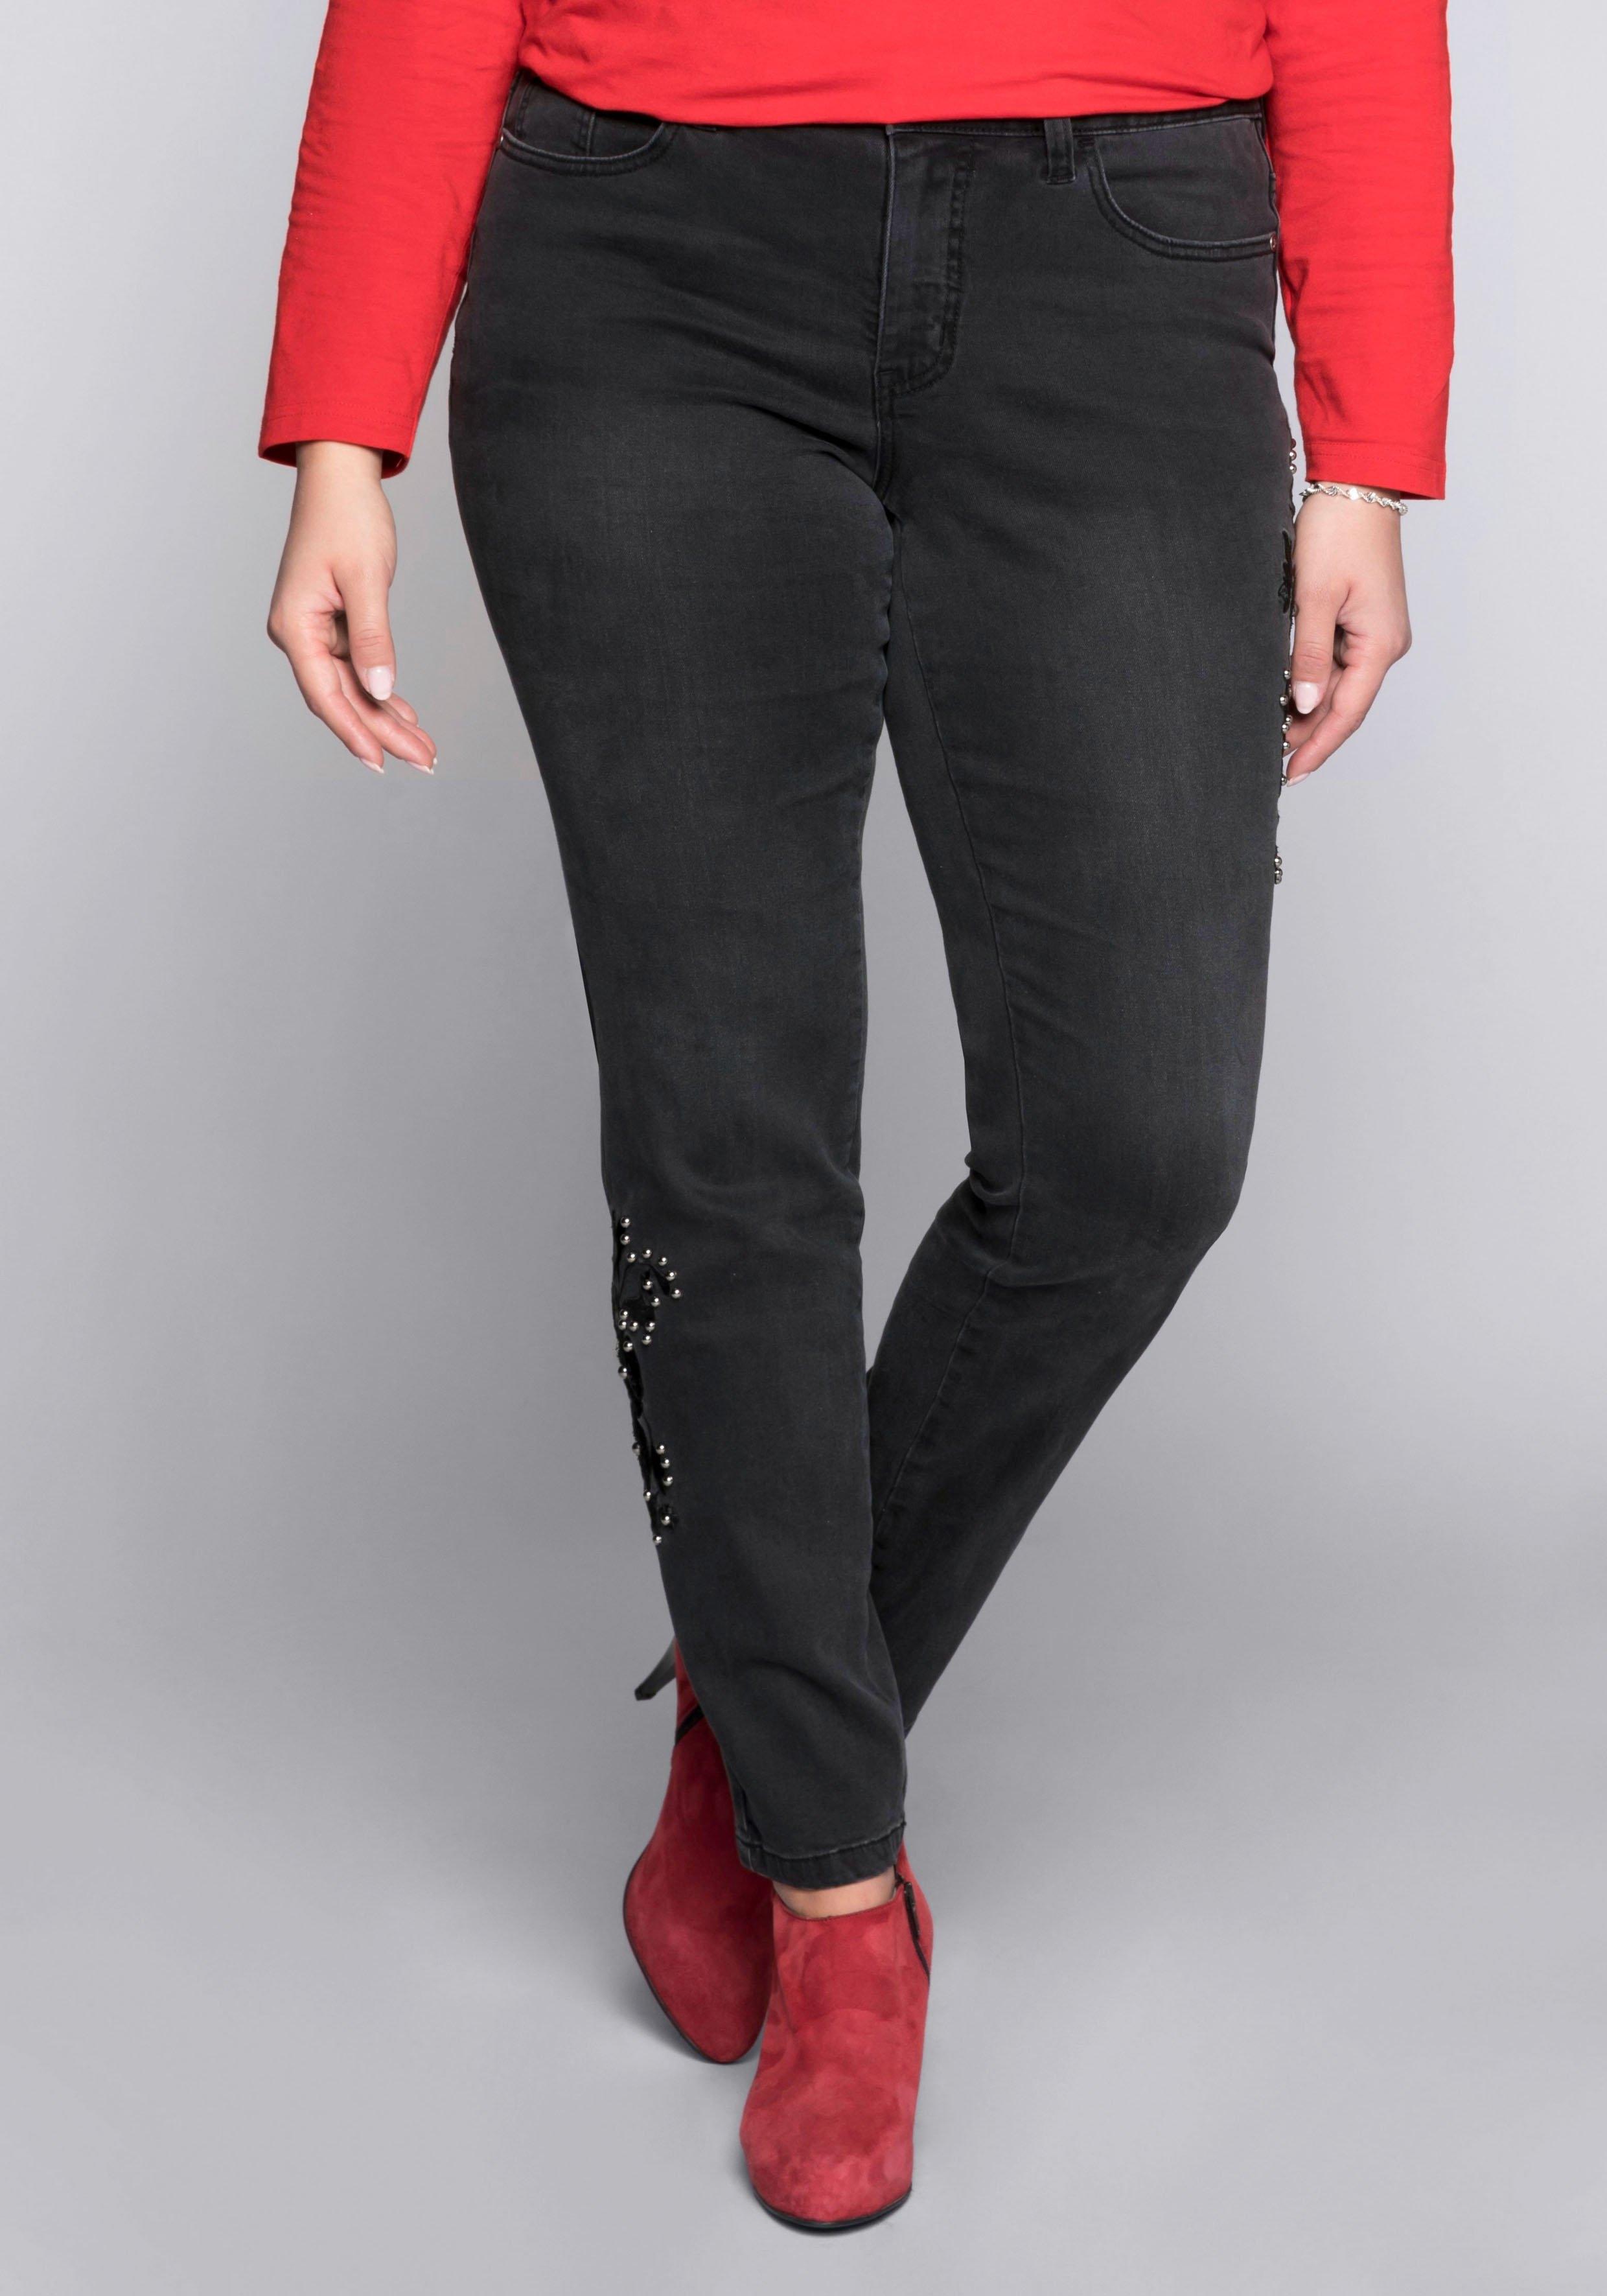 sheego by Joe Browns Joe Browns stretch jeans - verschillende betaalmethodes